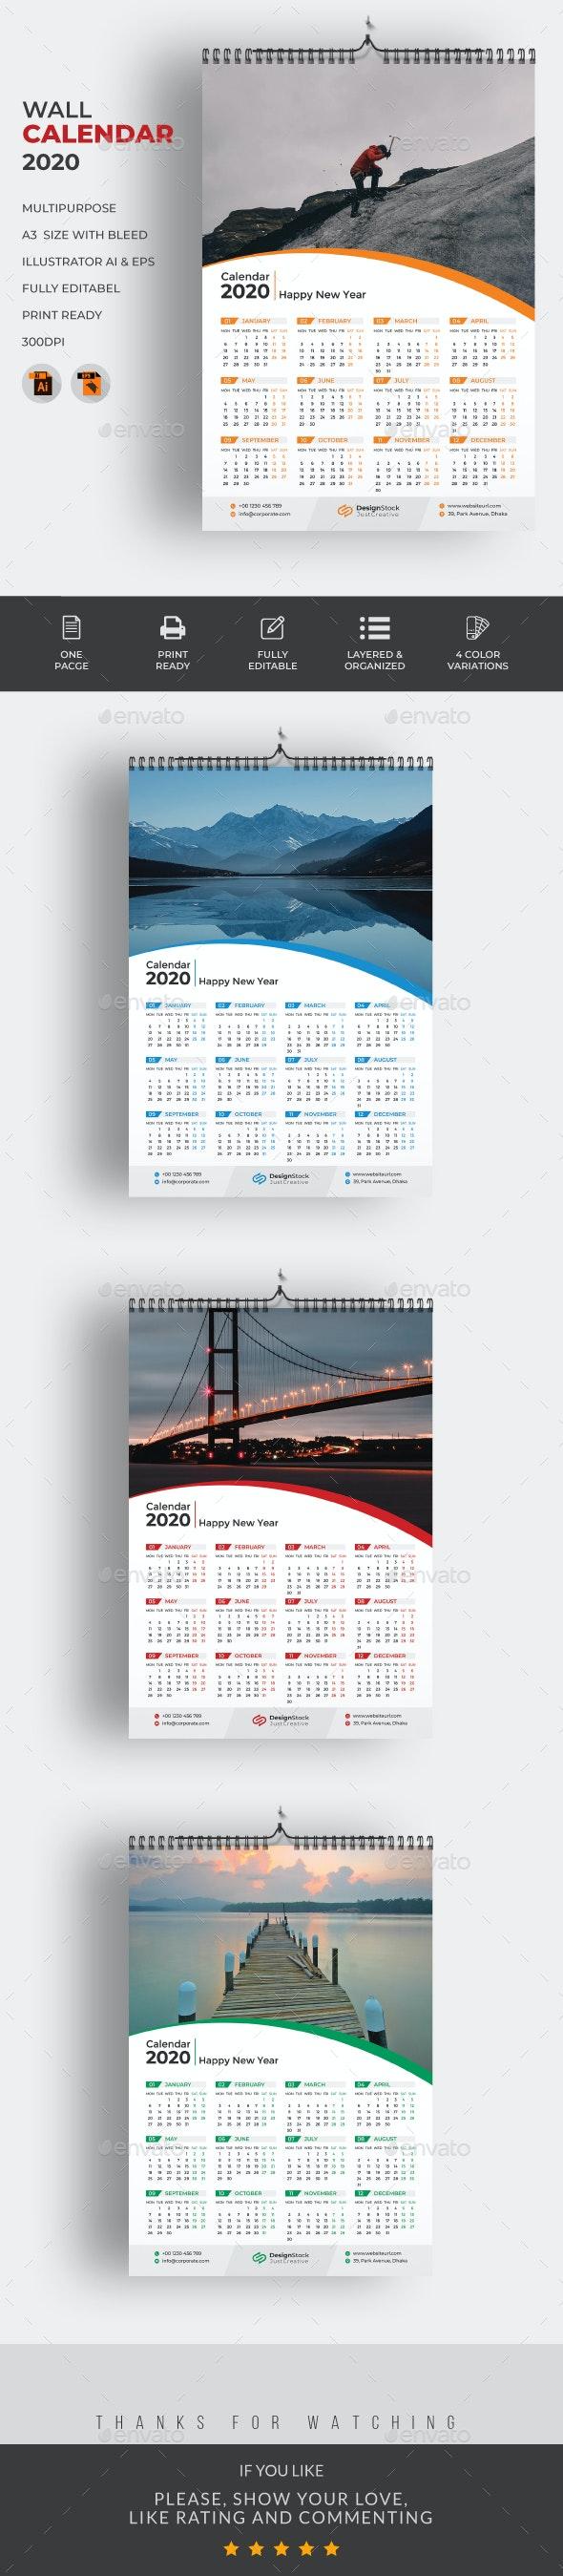 1 Page Wall Calendar 2020 - Calendars Stationery